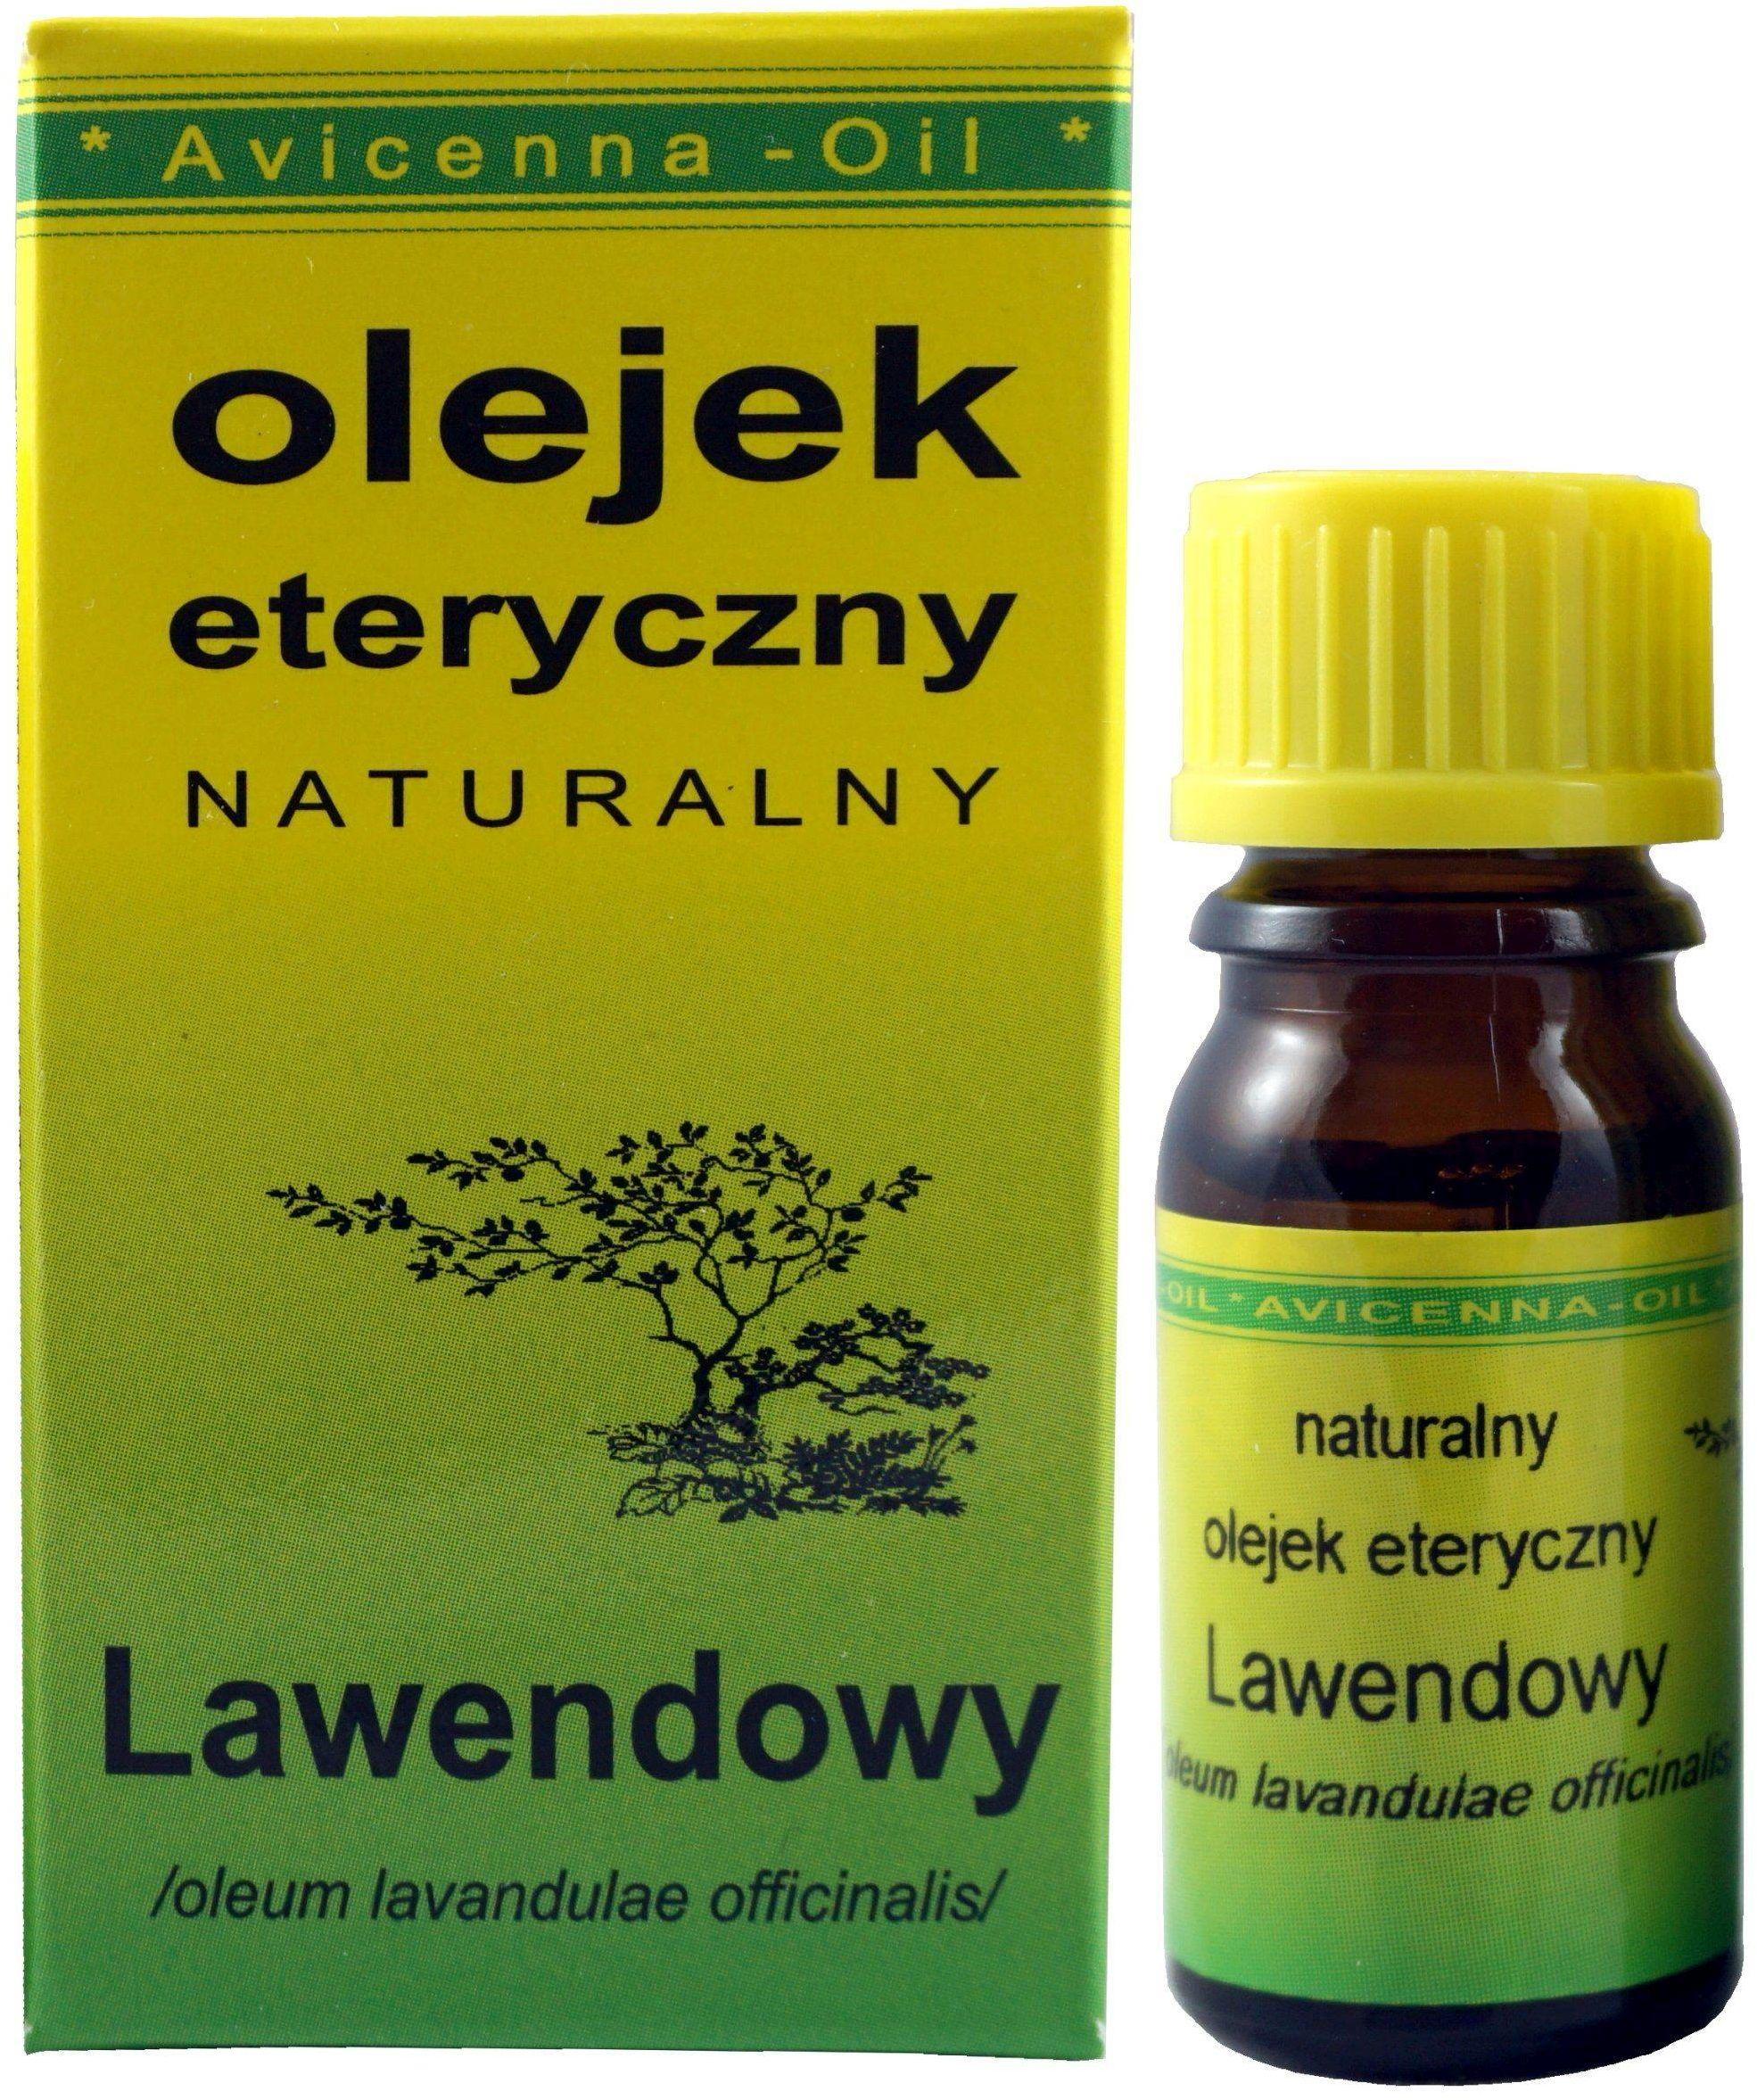 Olejek eteryczny Lawenda - 7ml - Avicenna Oil